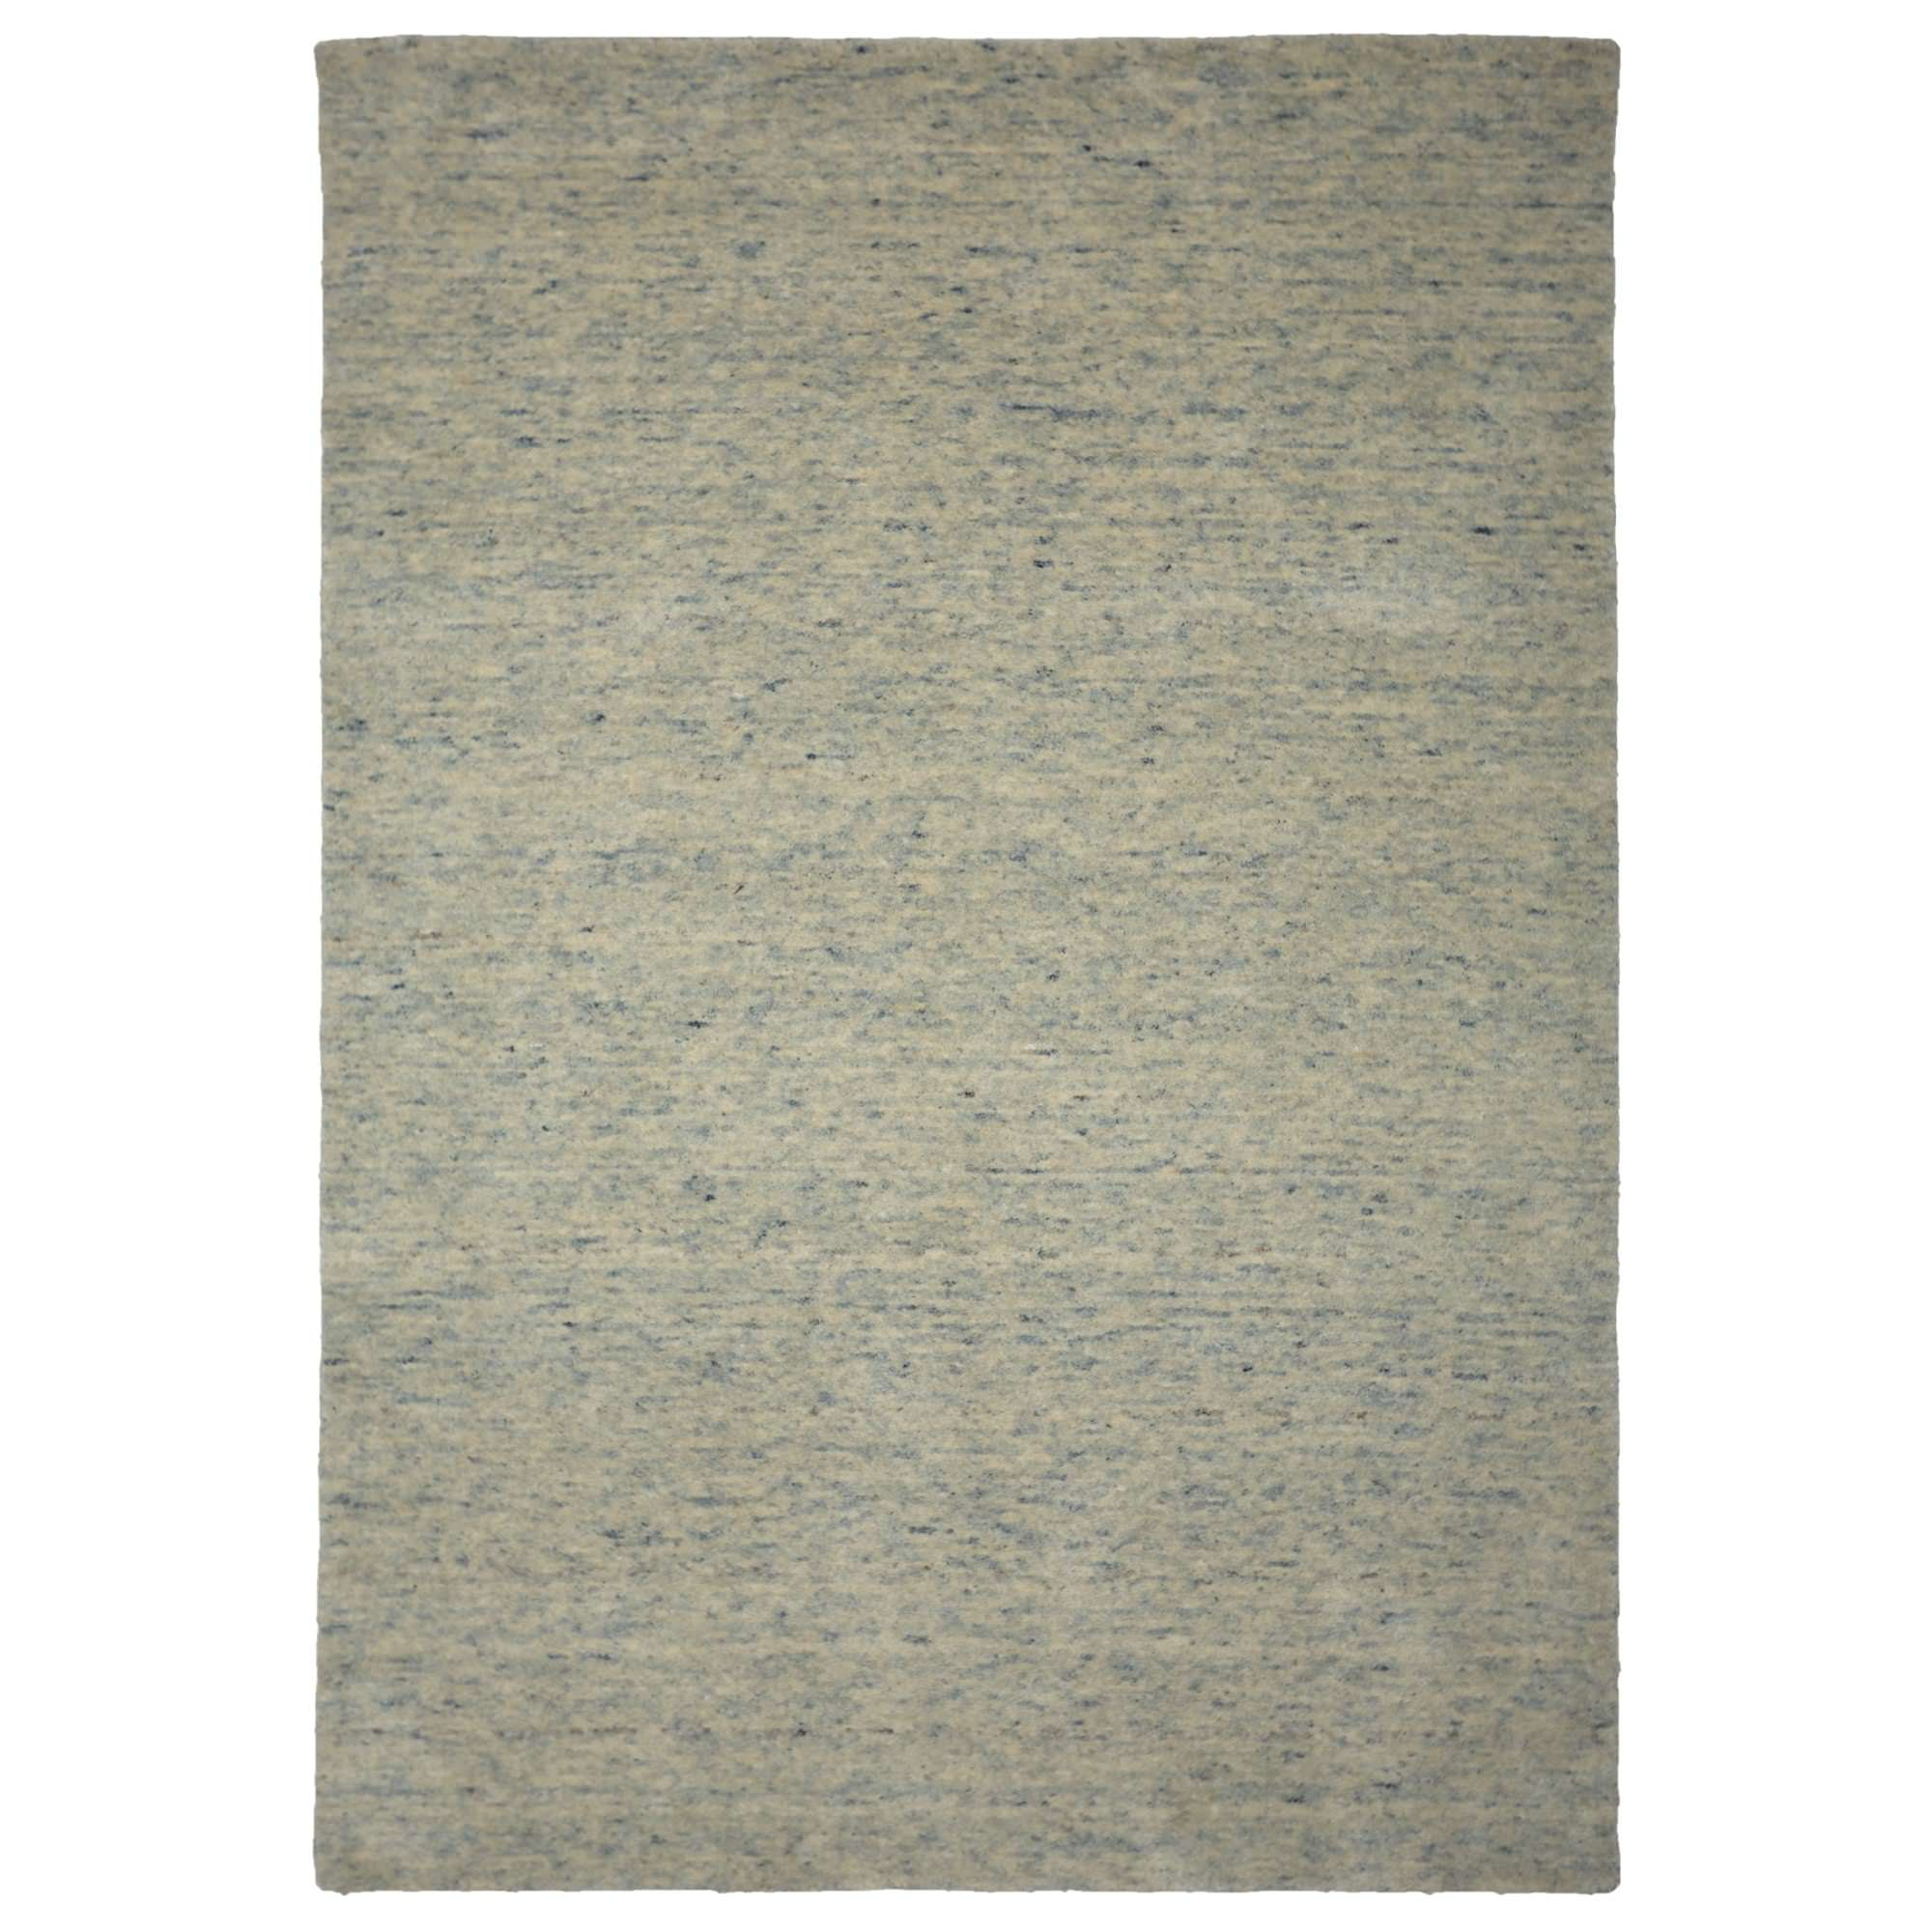 Ascot No.575 Handmade Wool Rug, 160x110cm, Sky Blue